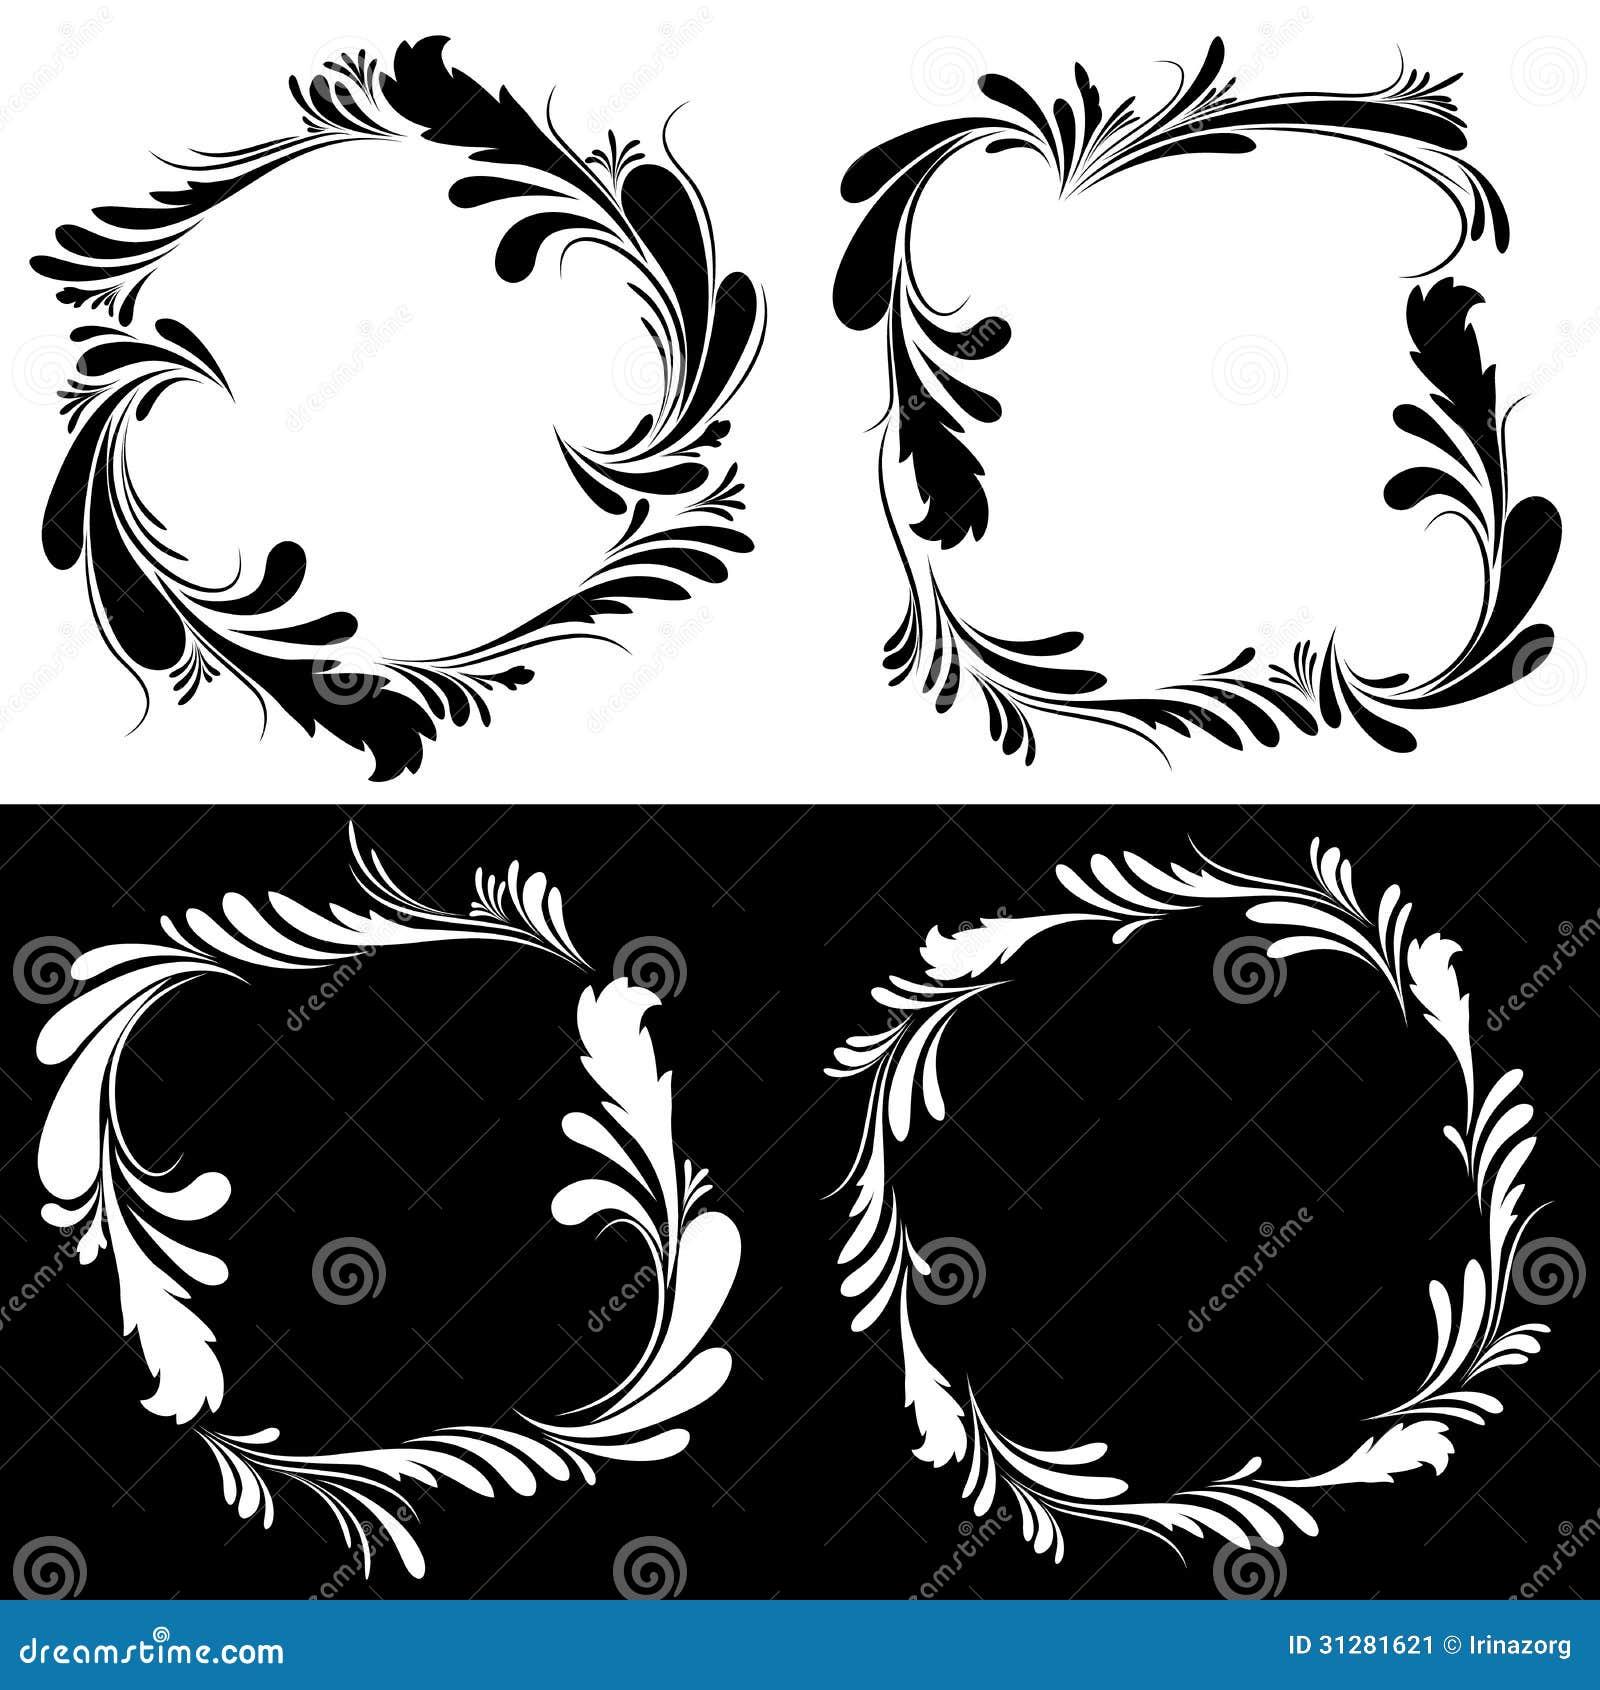 floral black and white frames